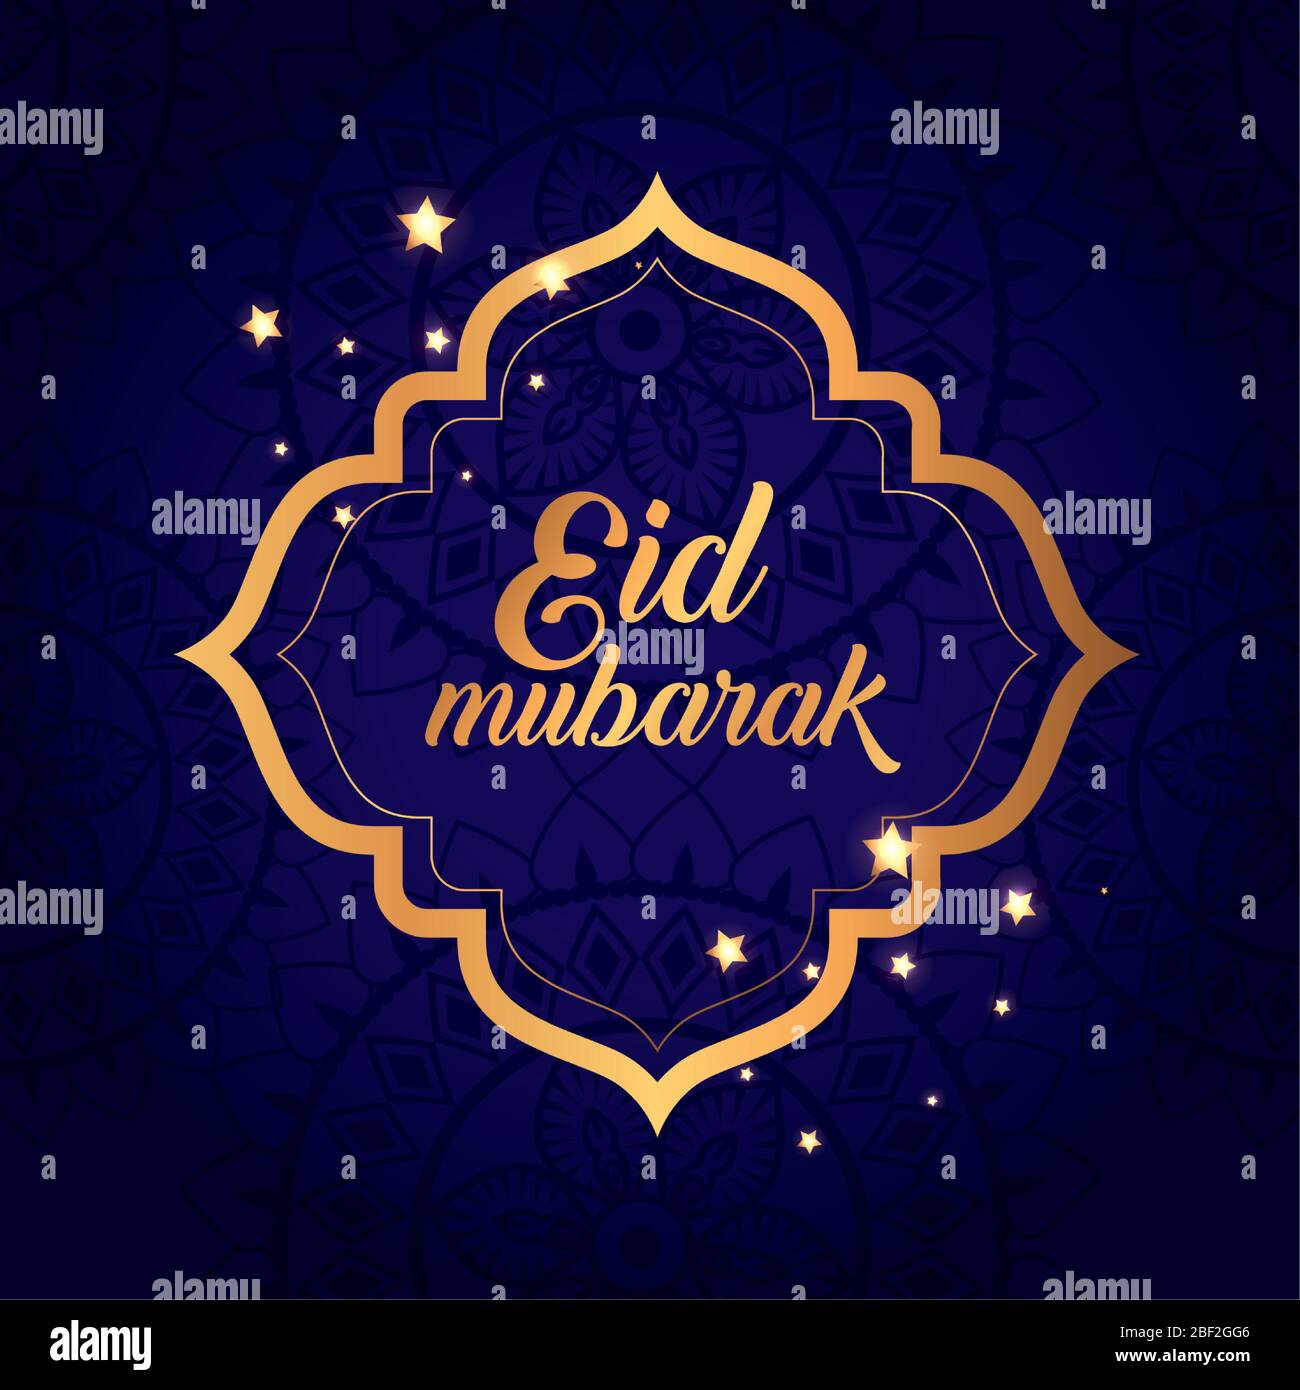 Eid Mubarak Poster With Decoration Stock Vector Image Art Alamy